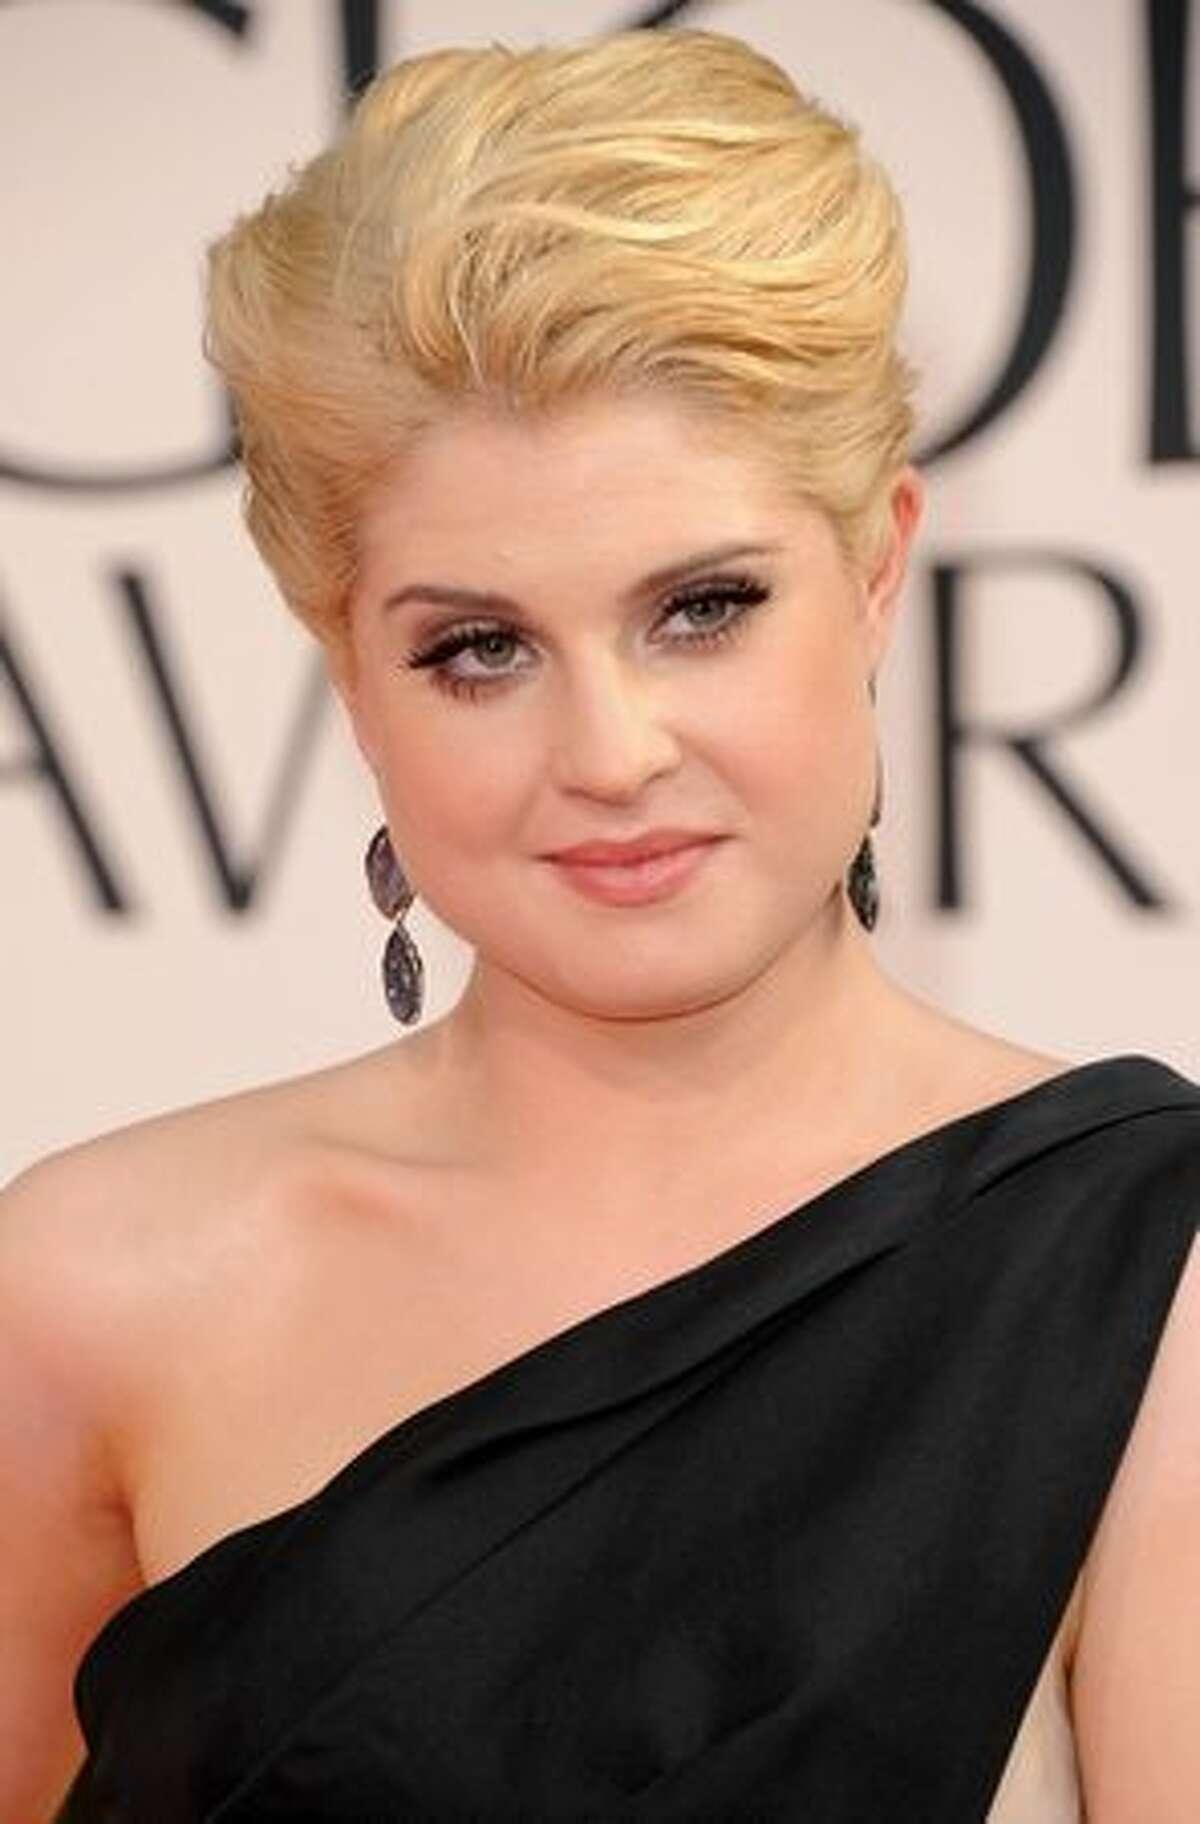 TV personality Kelly Osbourne.